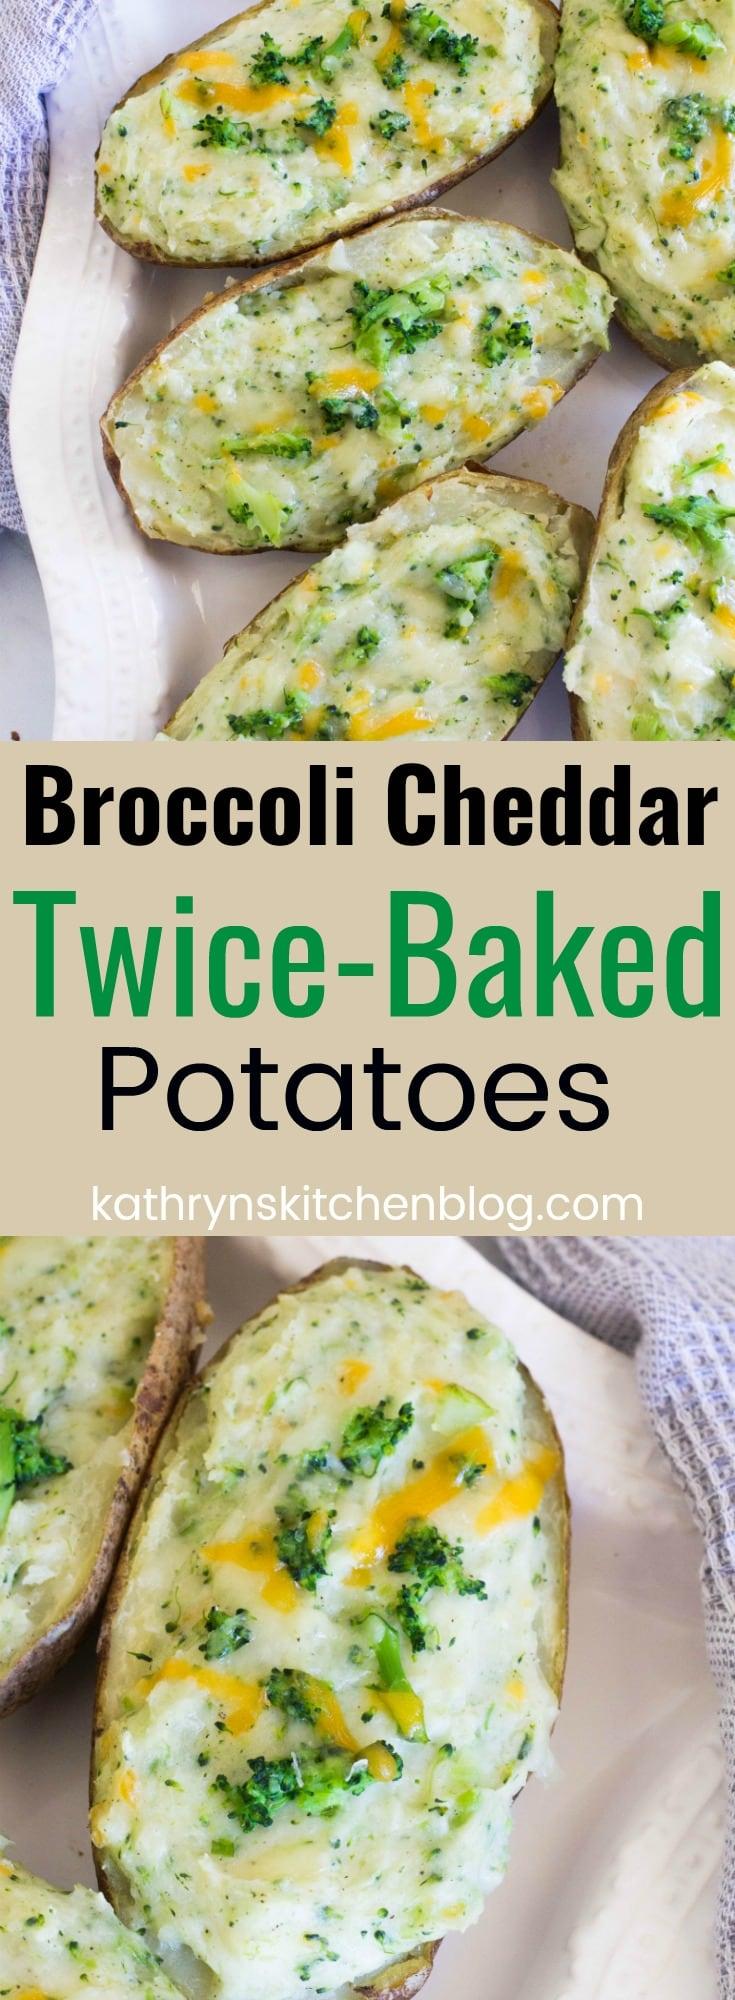 Broccoli Cheddar Twice-Baked Potatoes